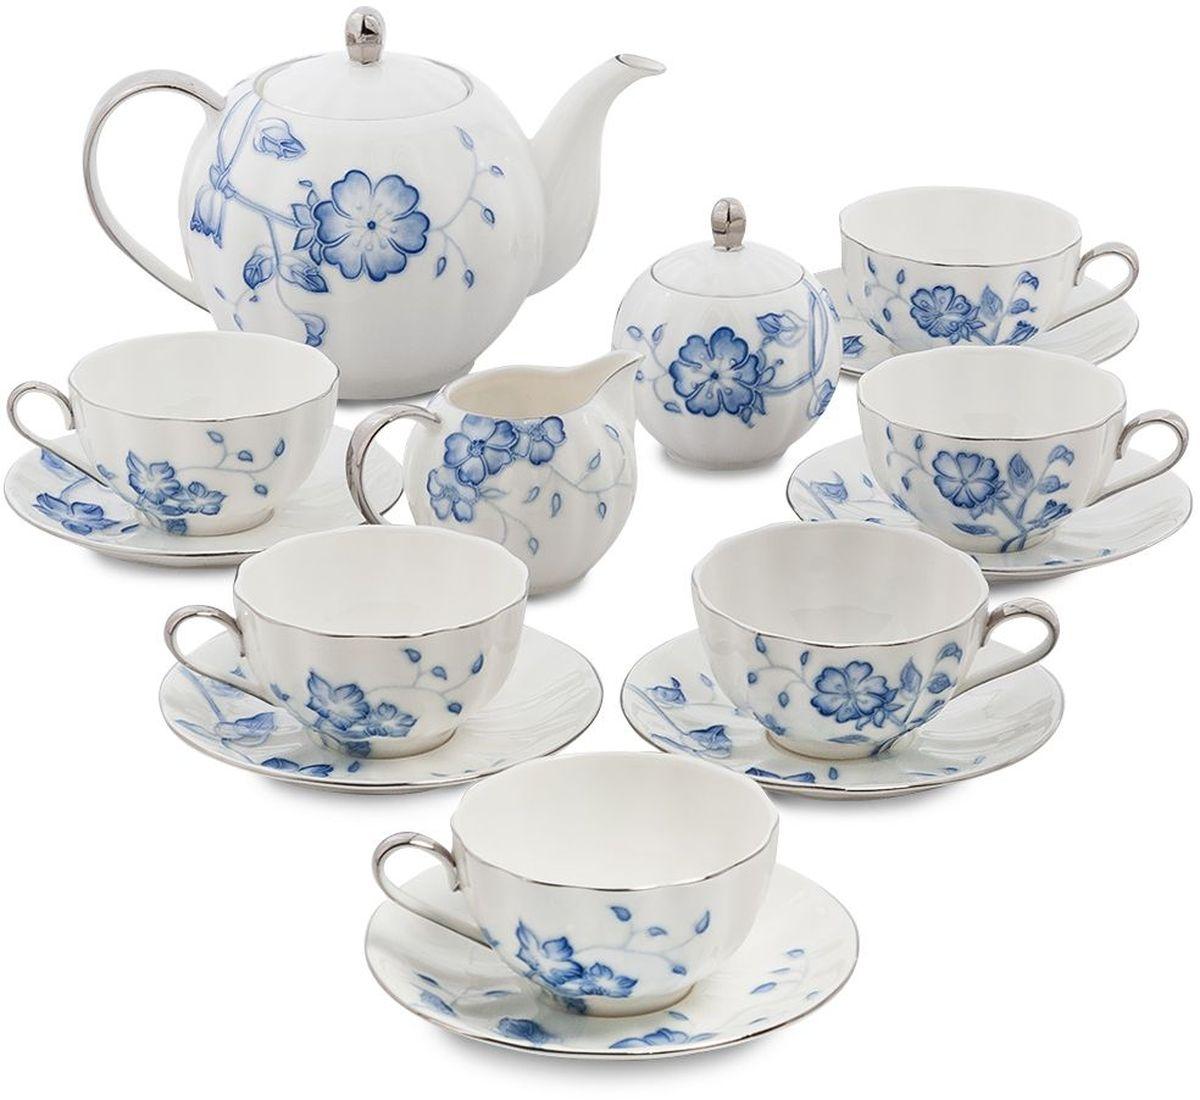 Сервиз чайный Pavone Голубая бабочка, 15 предметов. 451601451601Объем чайника: 1 лОбъем сахарницы: 200 мл Объем молочника: 200 мл Объем чашки: 200 млДиаметр блюдца: 14 см.